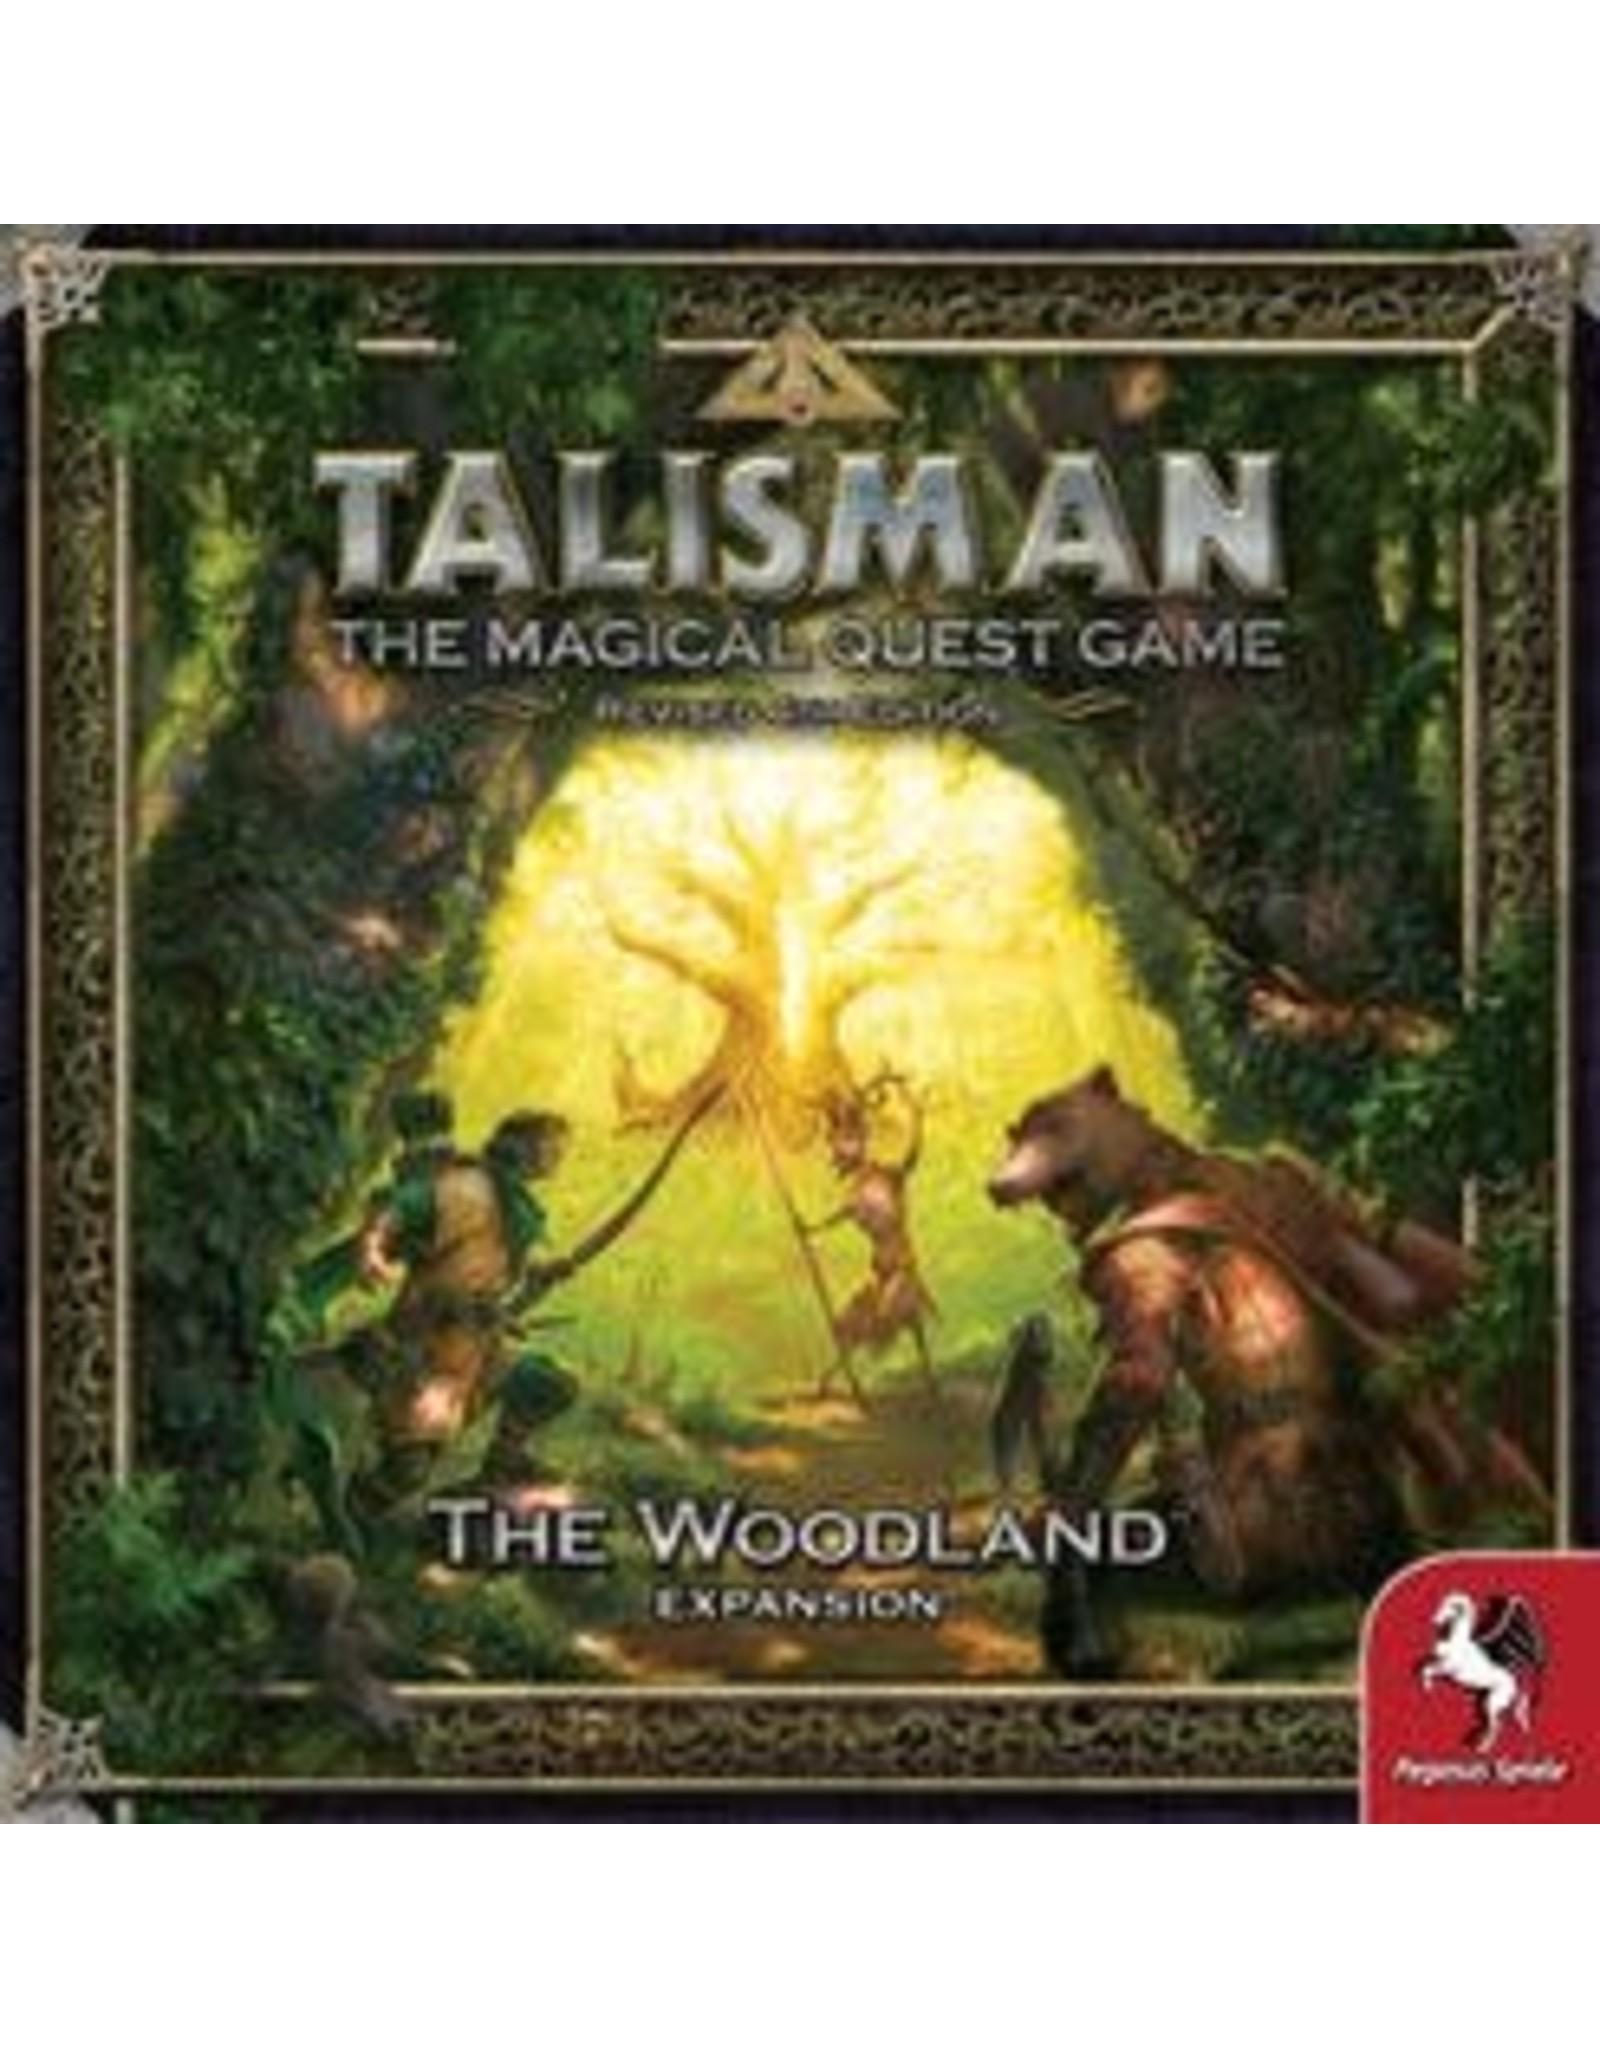 Talisman Expansion The Woodland